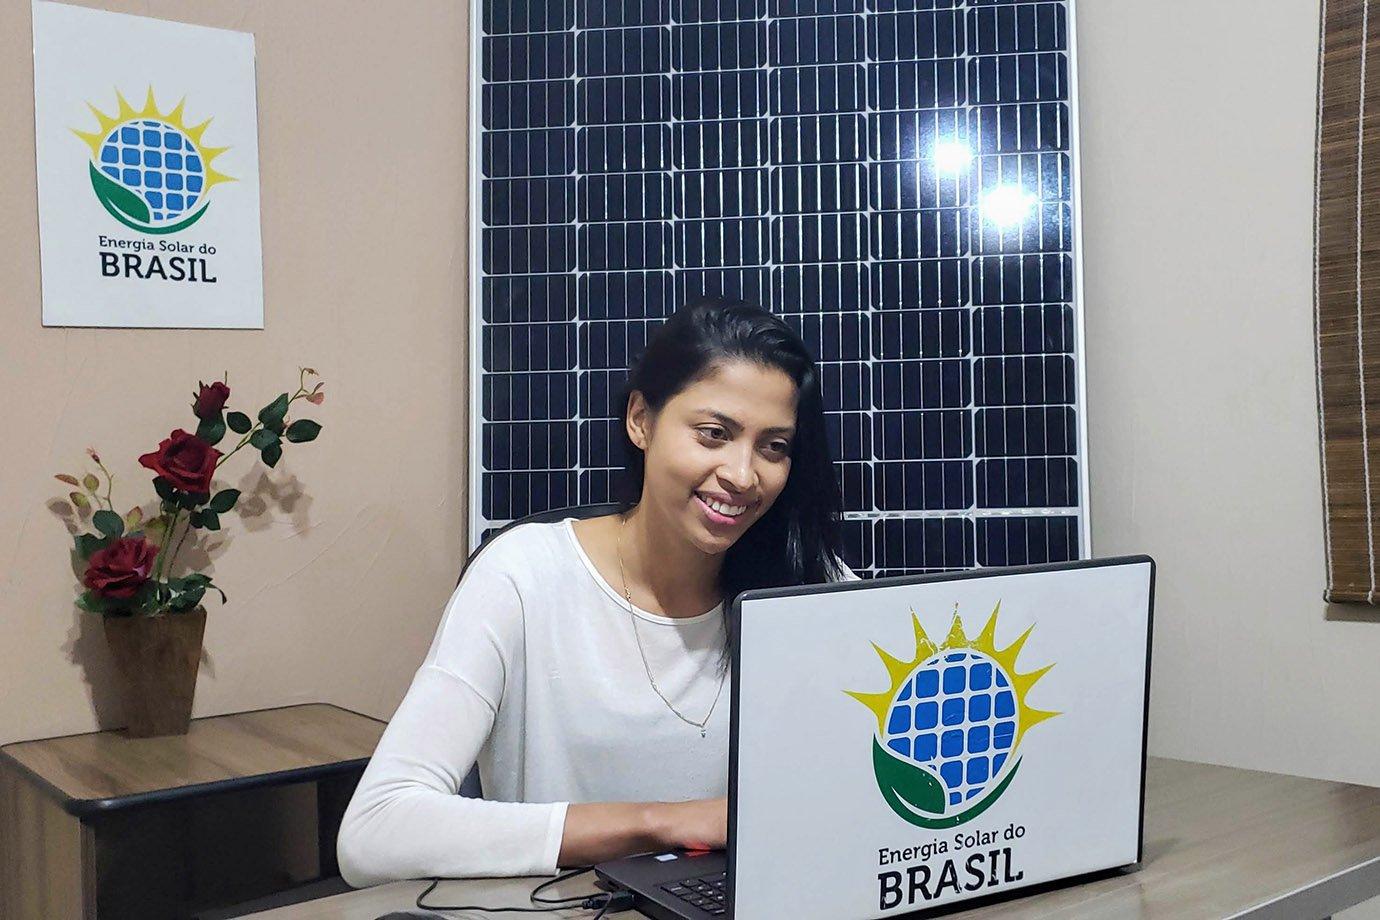 Energia Solar do Brasil